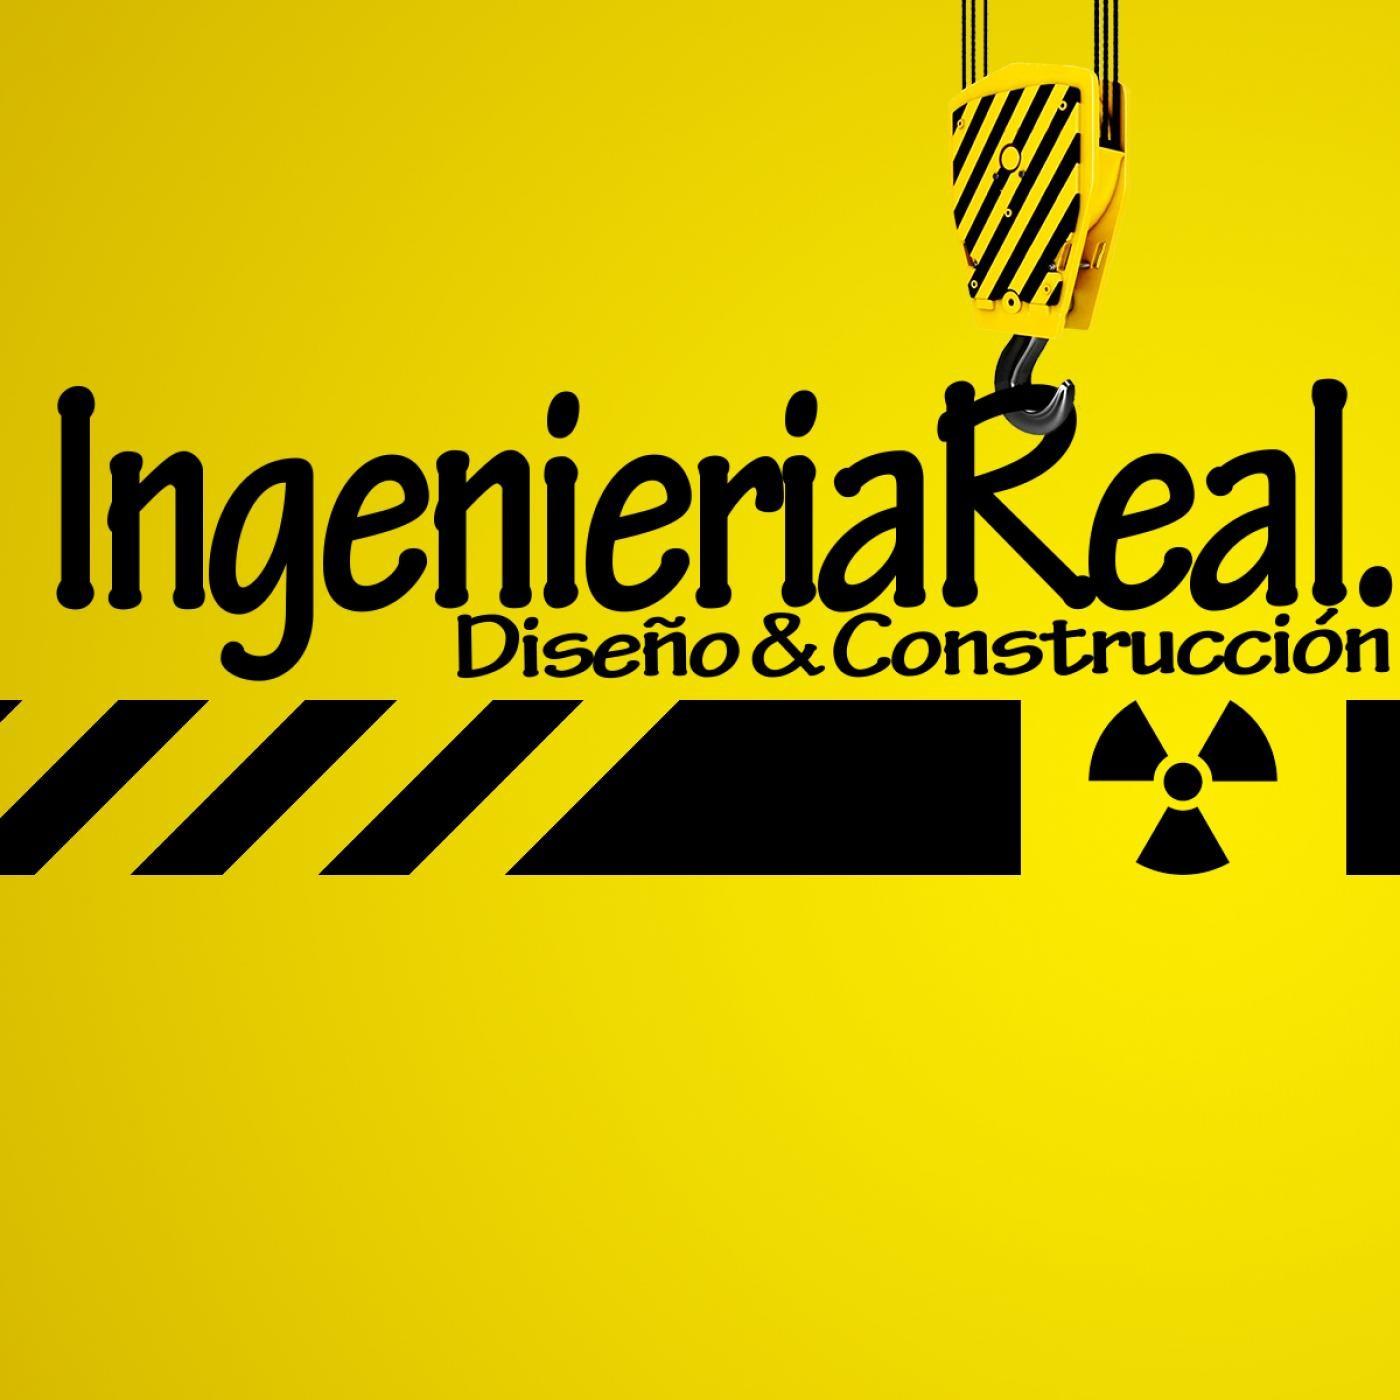 "Ingeniería Real <a href=""https://ingenieriareal.com/"" target=""_blank"" style=""overflow-wrap: break-word;"">www.ingenieriareal.com</a>"